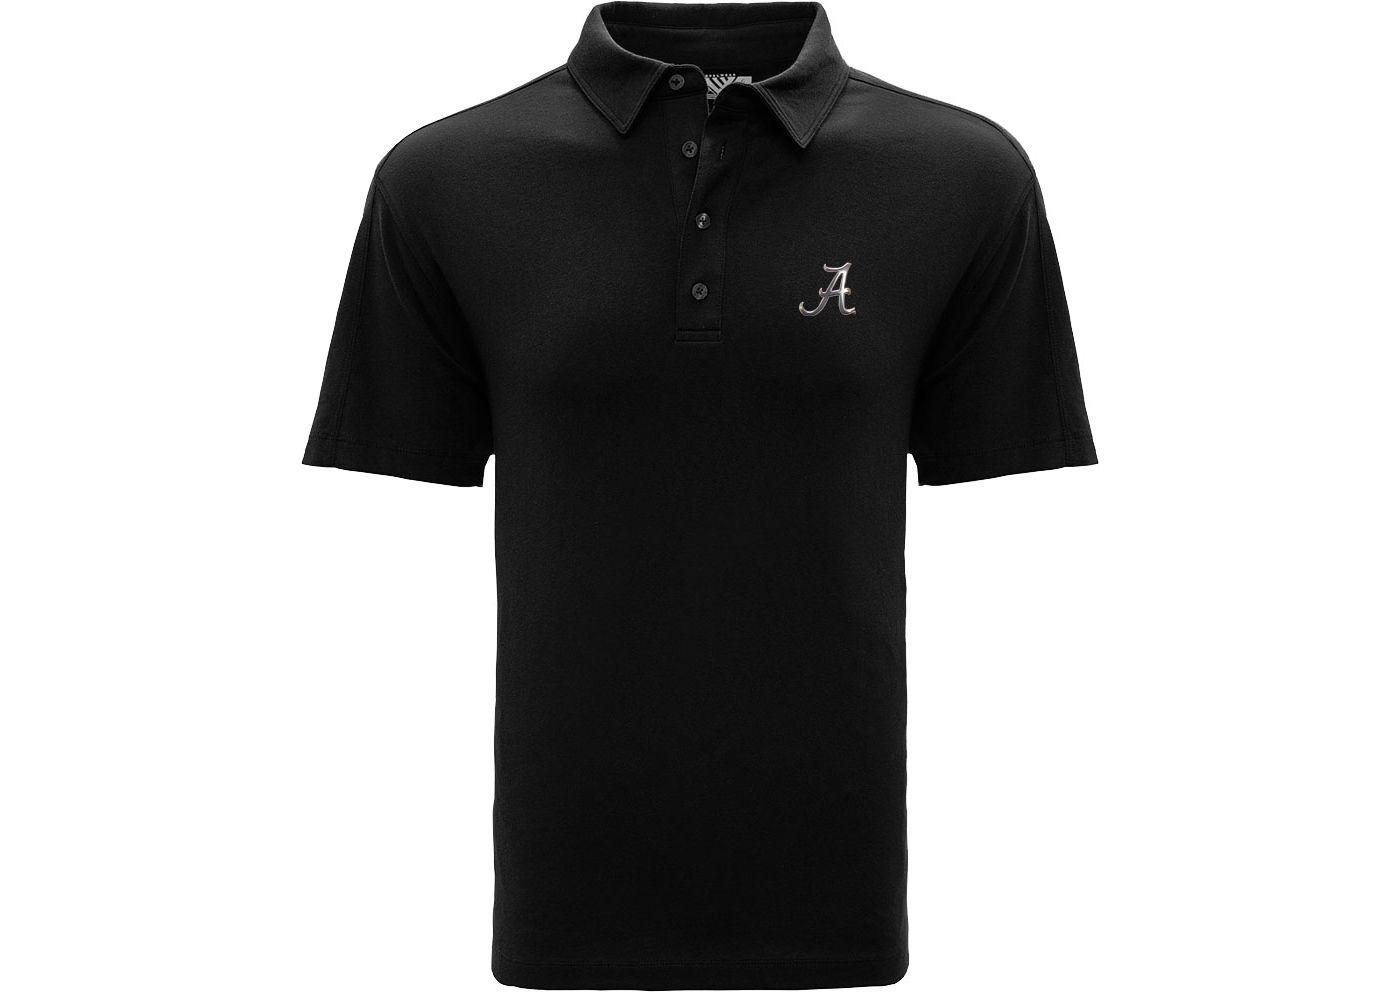 Levelwear Men's Alabama Crimson Tide Black Reign Polo